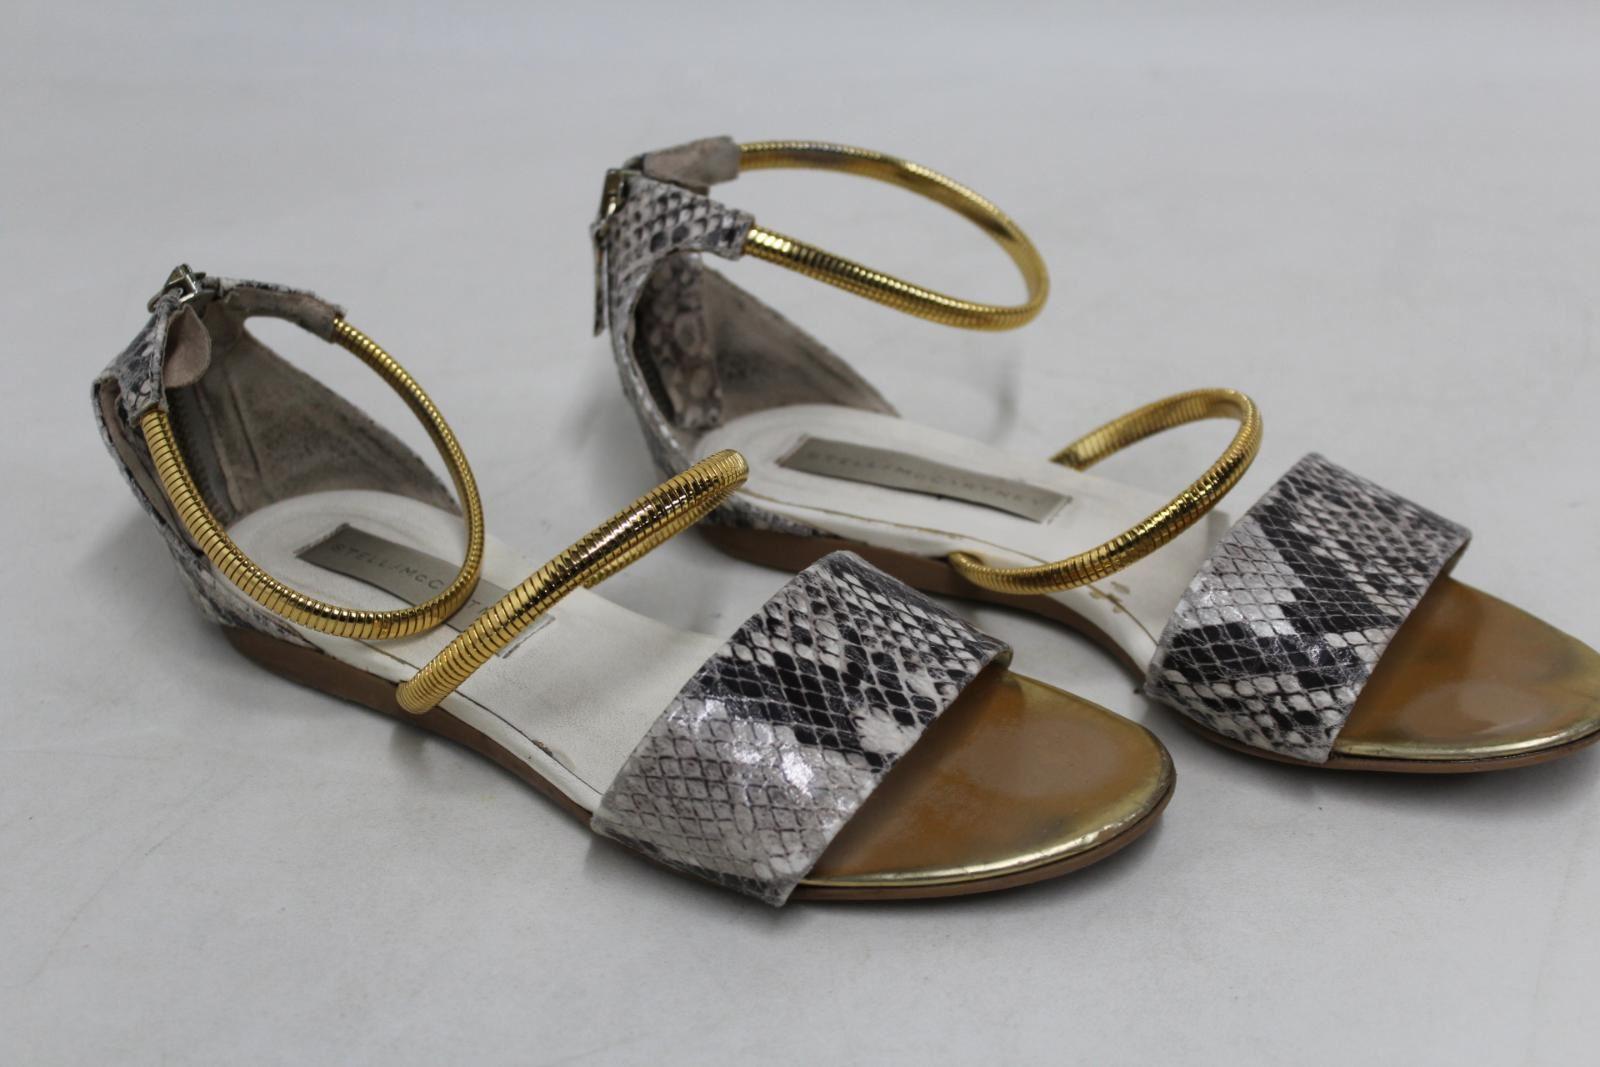 STELLA MCCARTNEY Ladies Faux Leather Snake Print Slingback Sandal shoes UK4 EU36